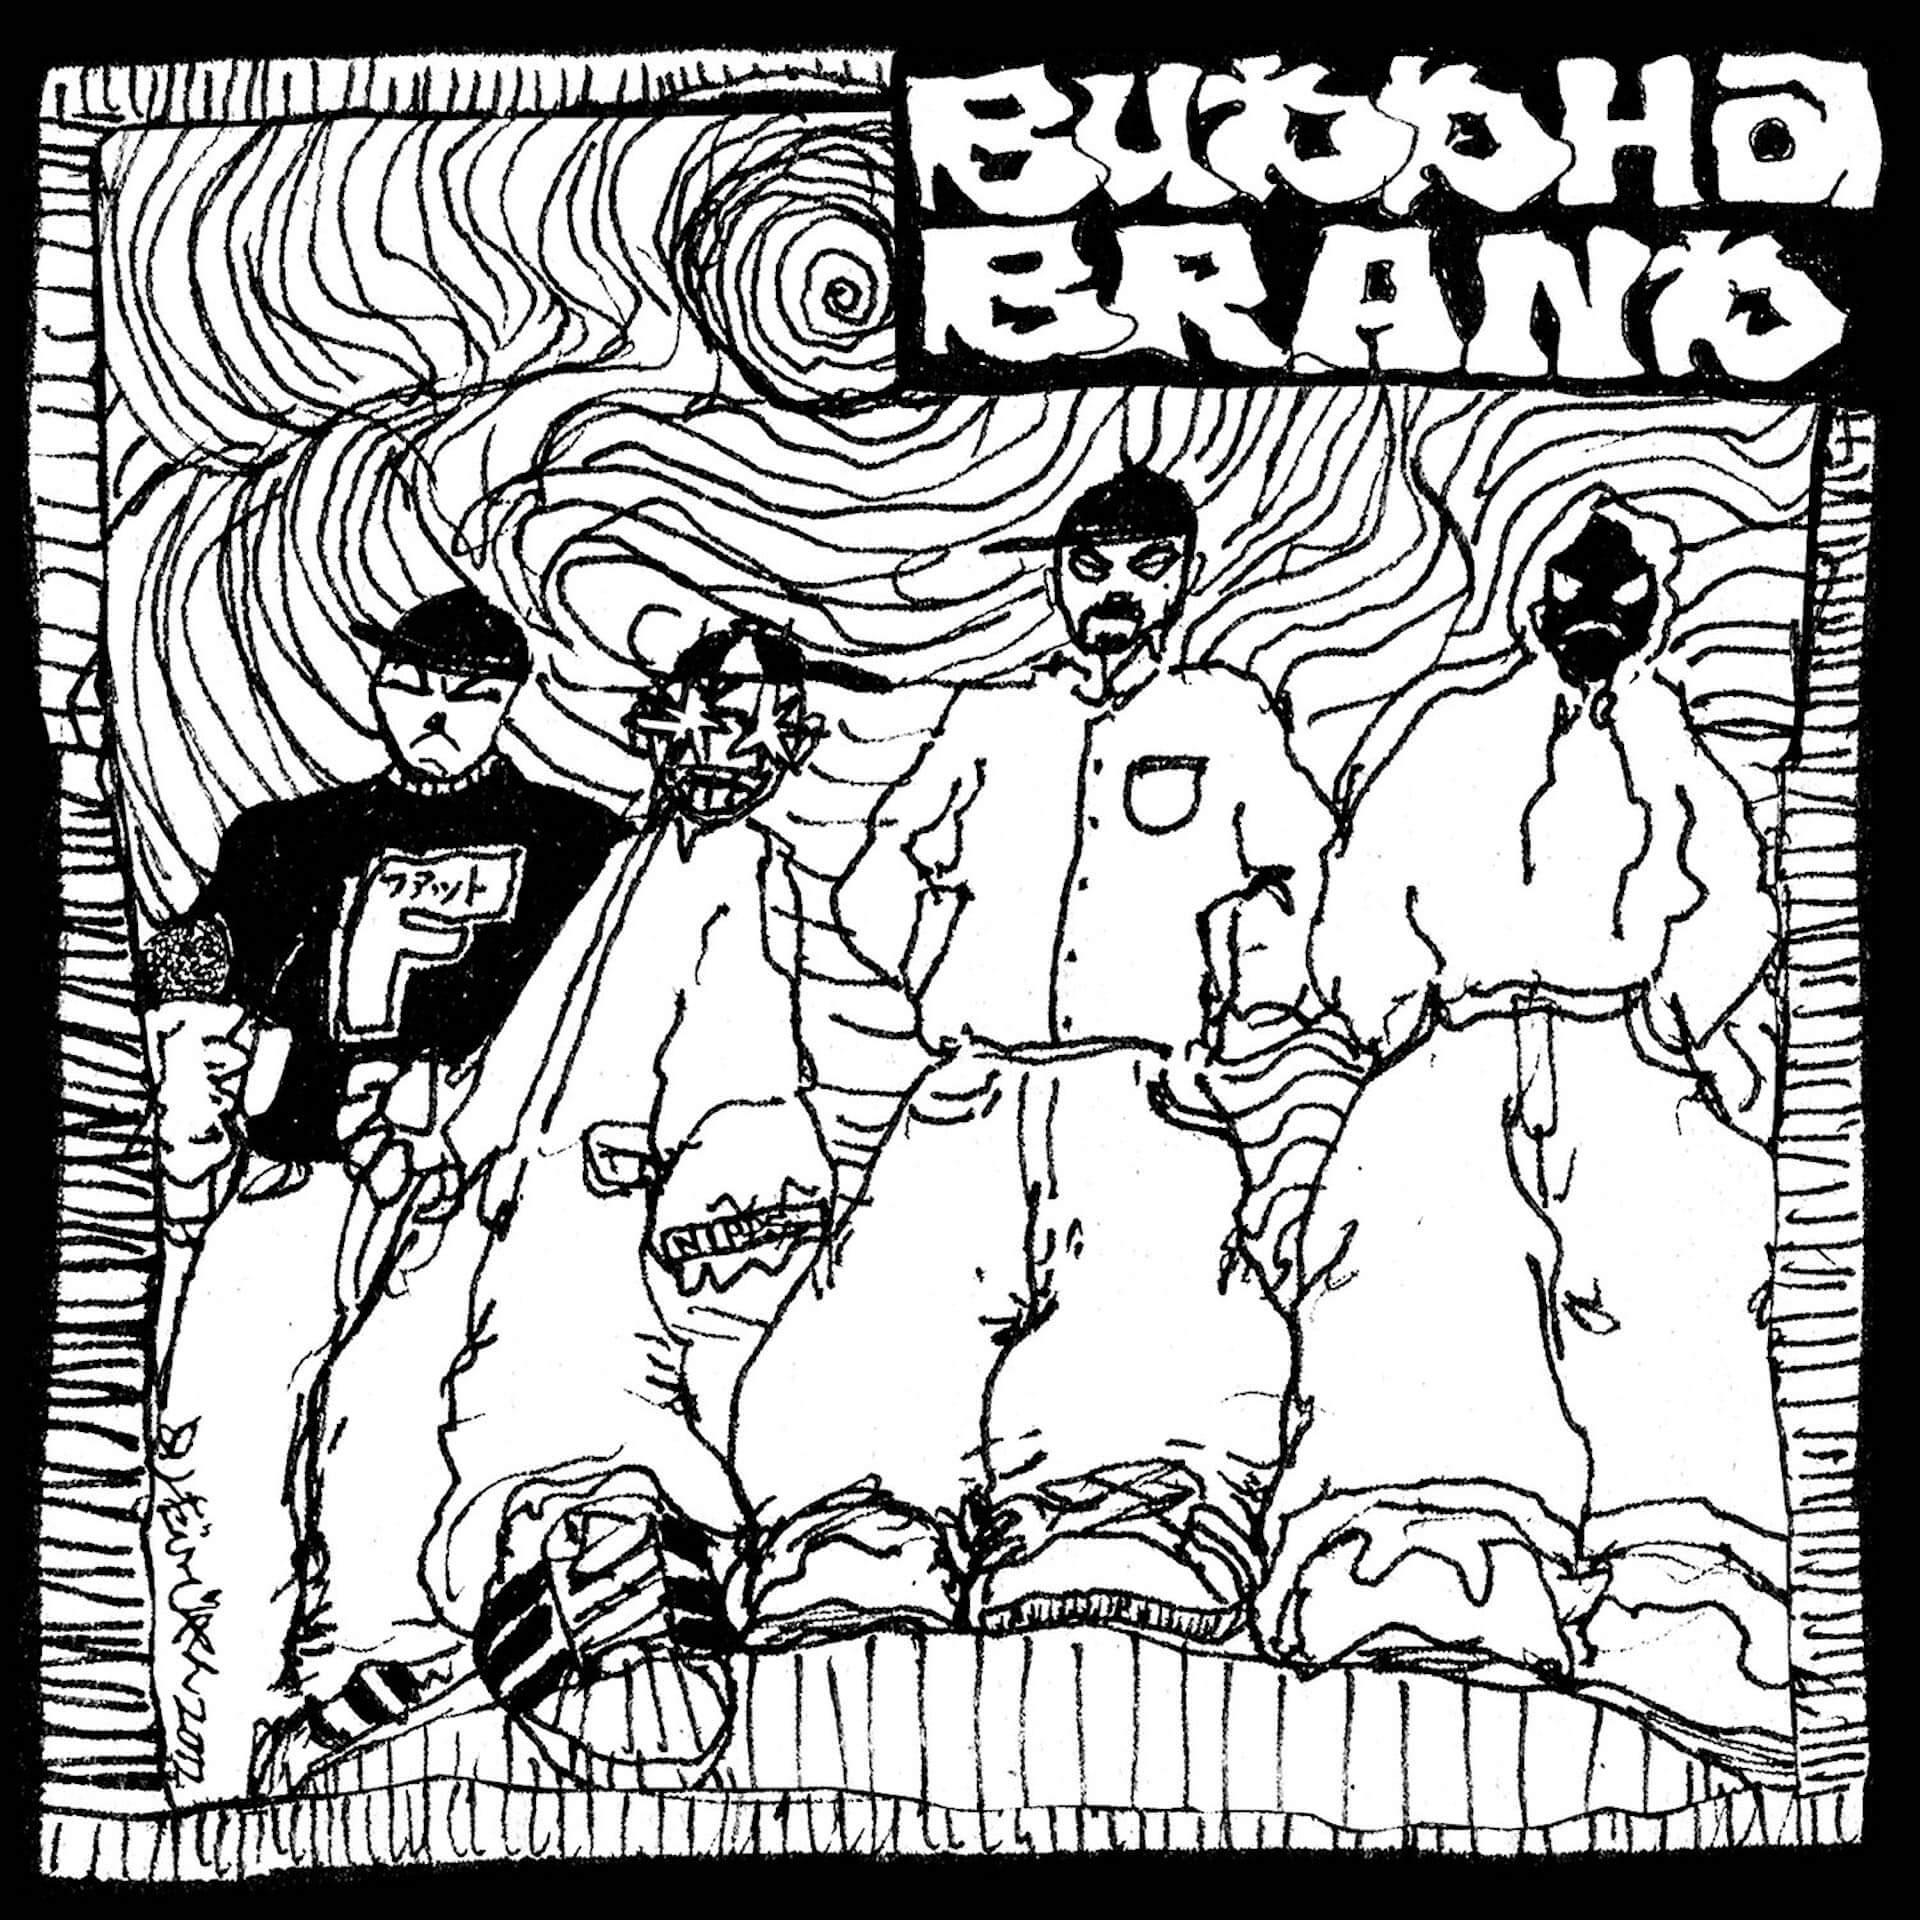 BUDDHA BRAND、10月発売のニューアルバム『コレがブッダブランド!』のアートワークが公開 music190926-buddha-brand-1